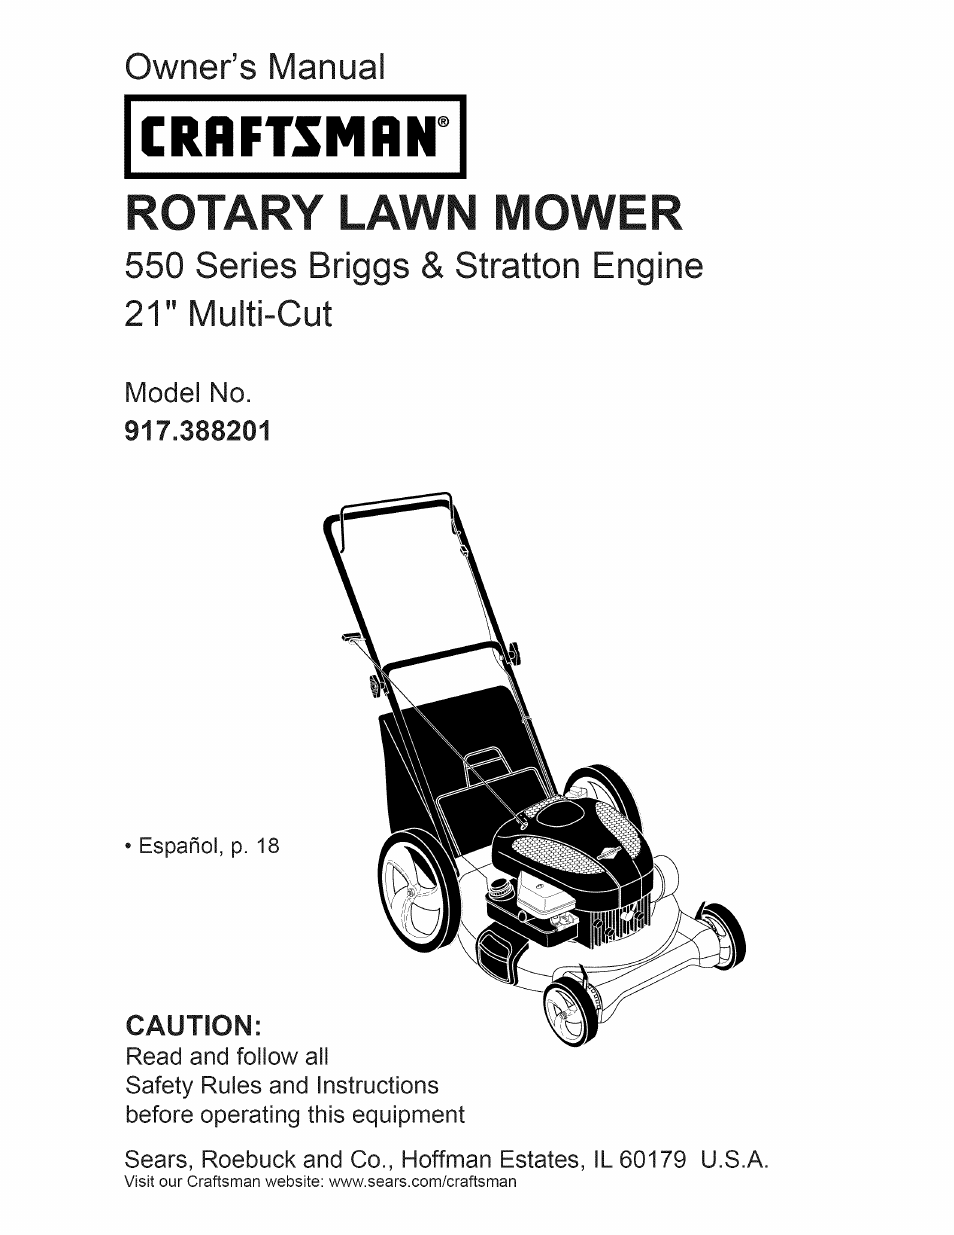 craftsman 917 388201 user manual 44 pages rh manualsdir com craftsman  briggs and stratton 550 series manual craftsman lawn edger/trencher 550 ...